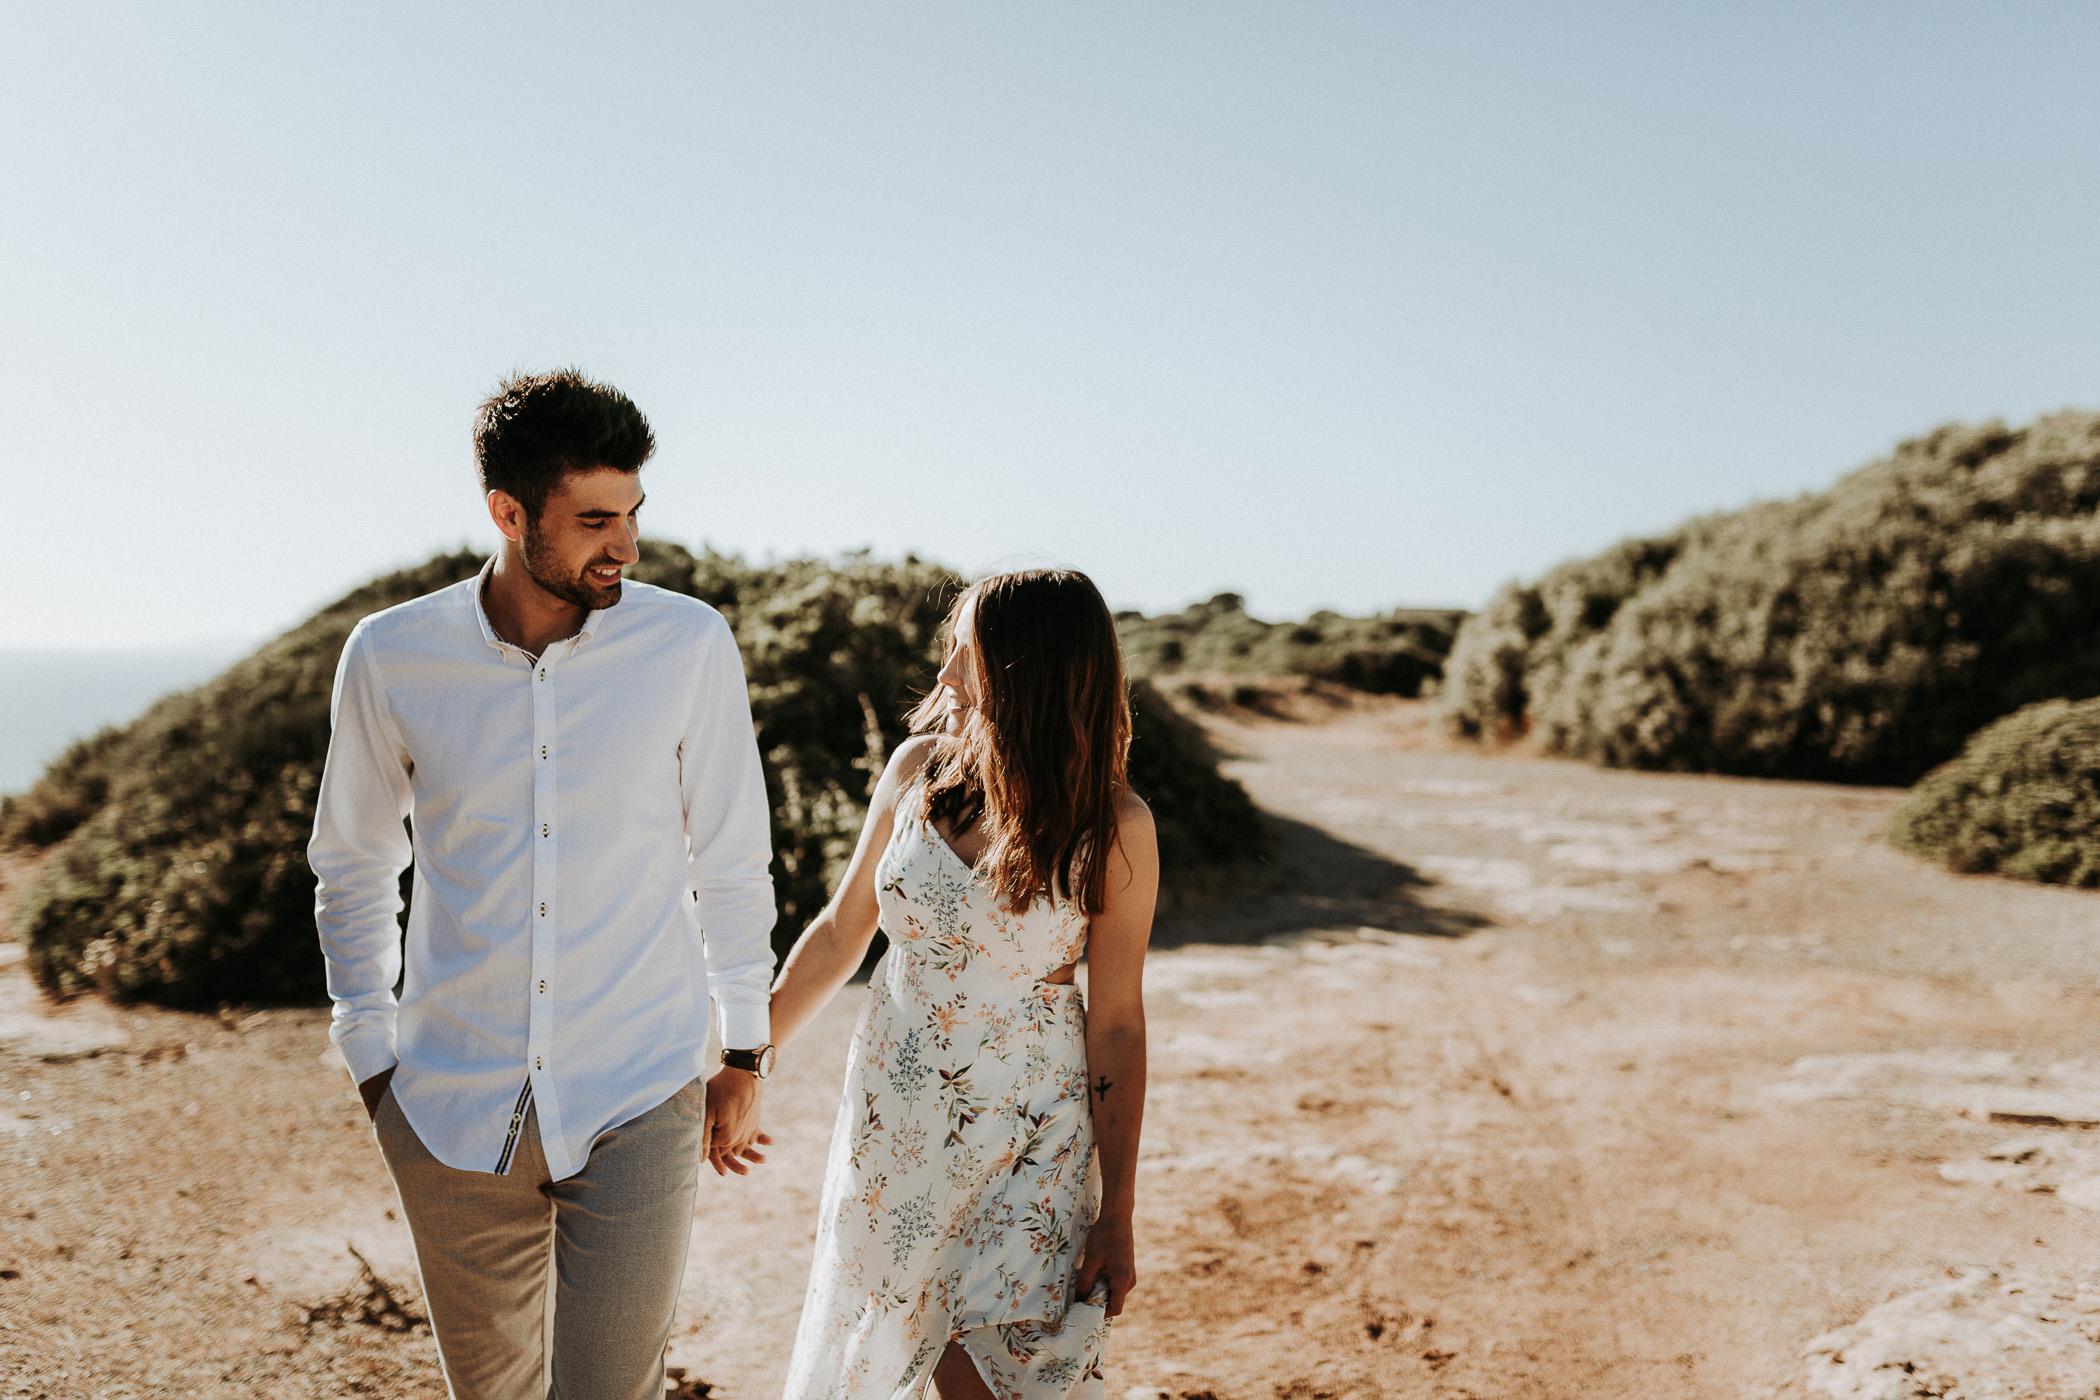 DanielaMarquardtPhotography_wedding_elopement_mallorca_spain_calapi_palma_lauraandtoni_6